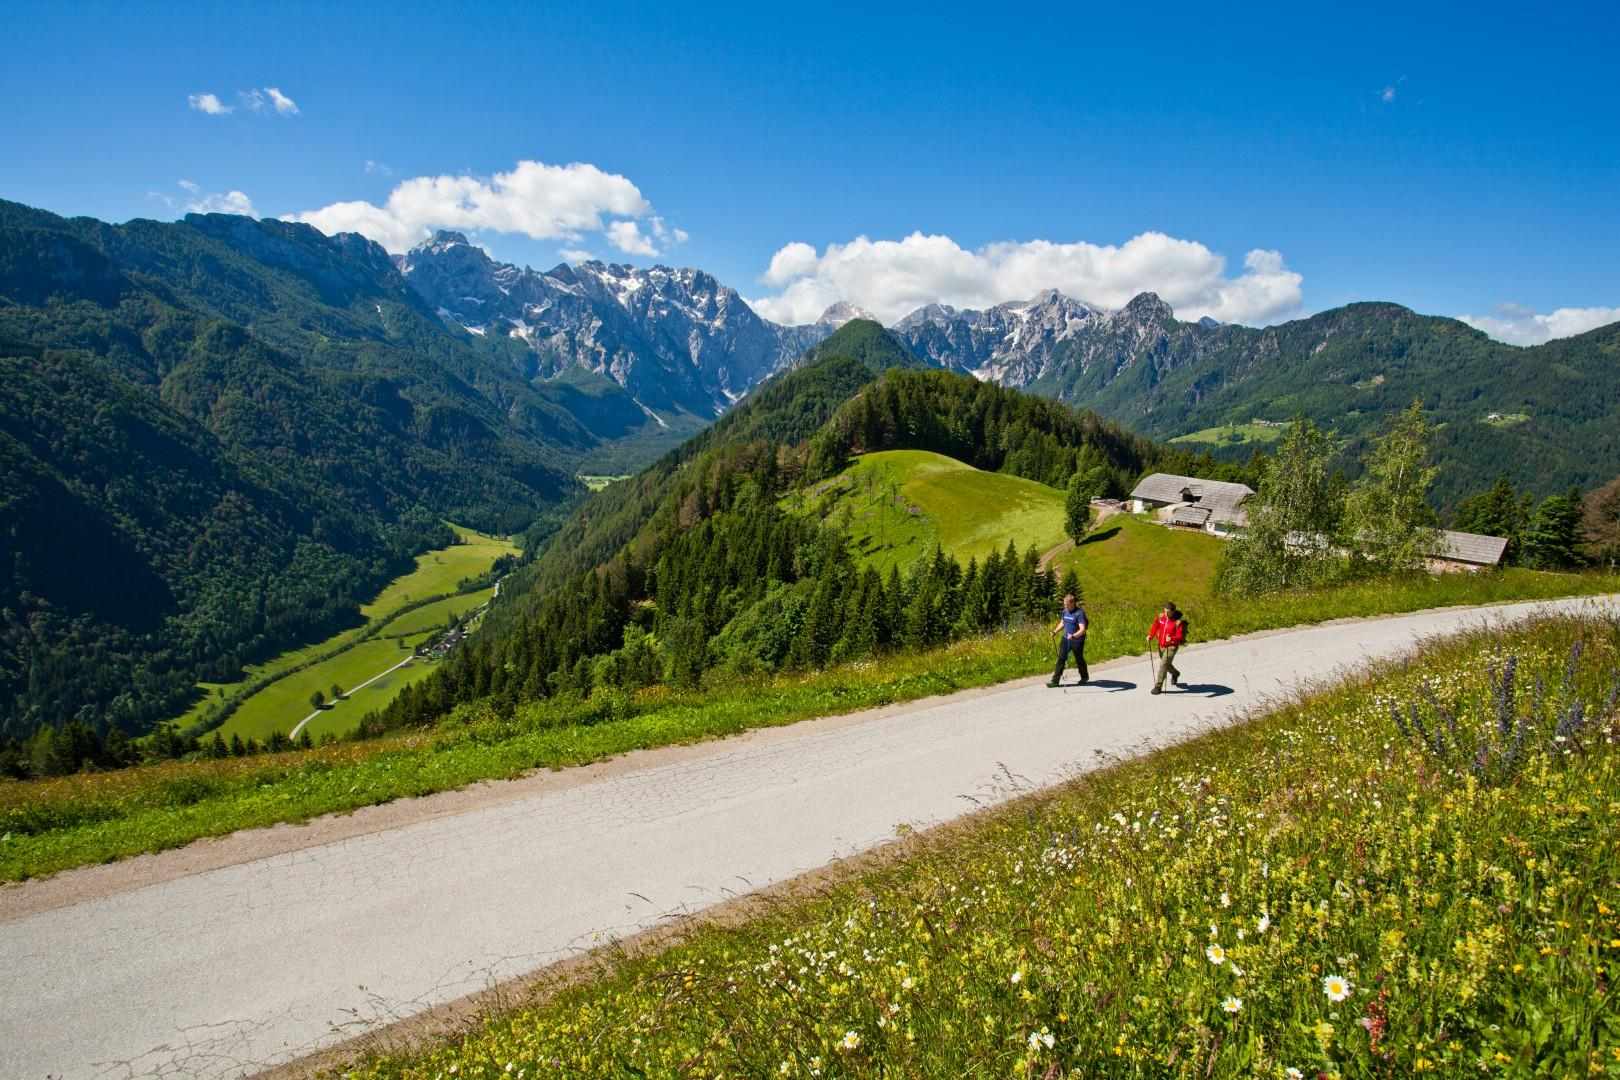 Solüavska-panoramska-cesta_pohodniÁtvo_Savinjska-dolina_Solüava-Panoramic-road_hiking-in-Slovenia_foto-JoÁt-Gantar